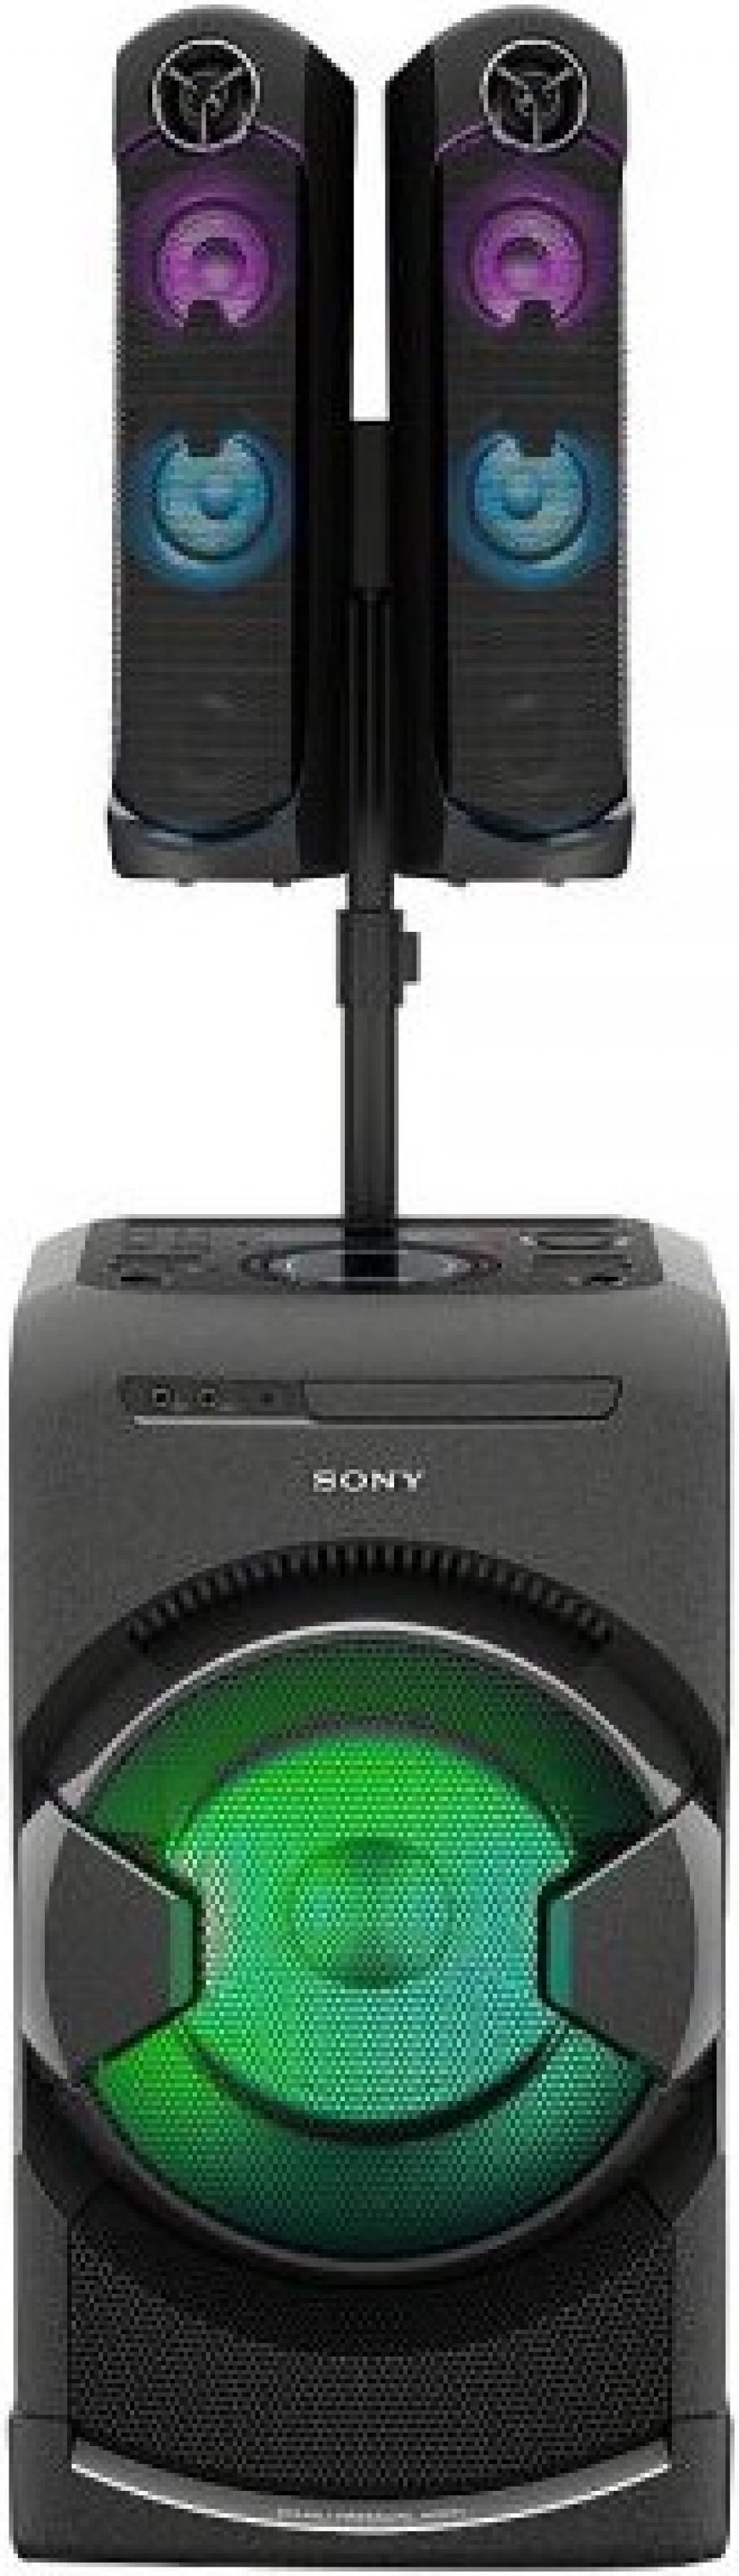 Мини системa Sony MHC-GT4D